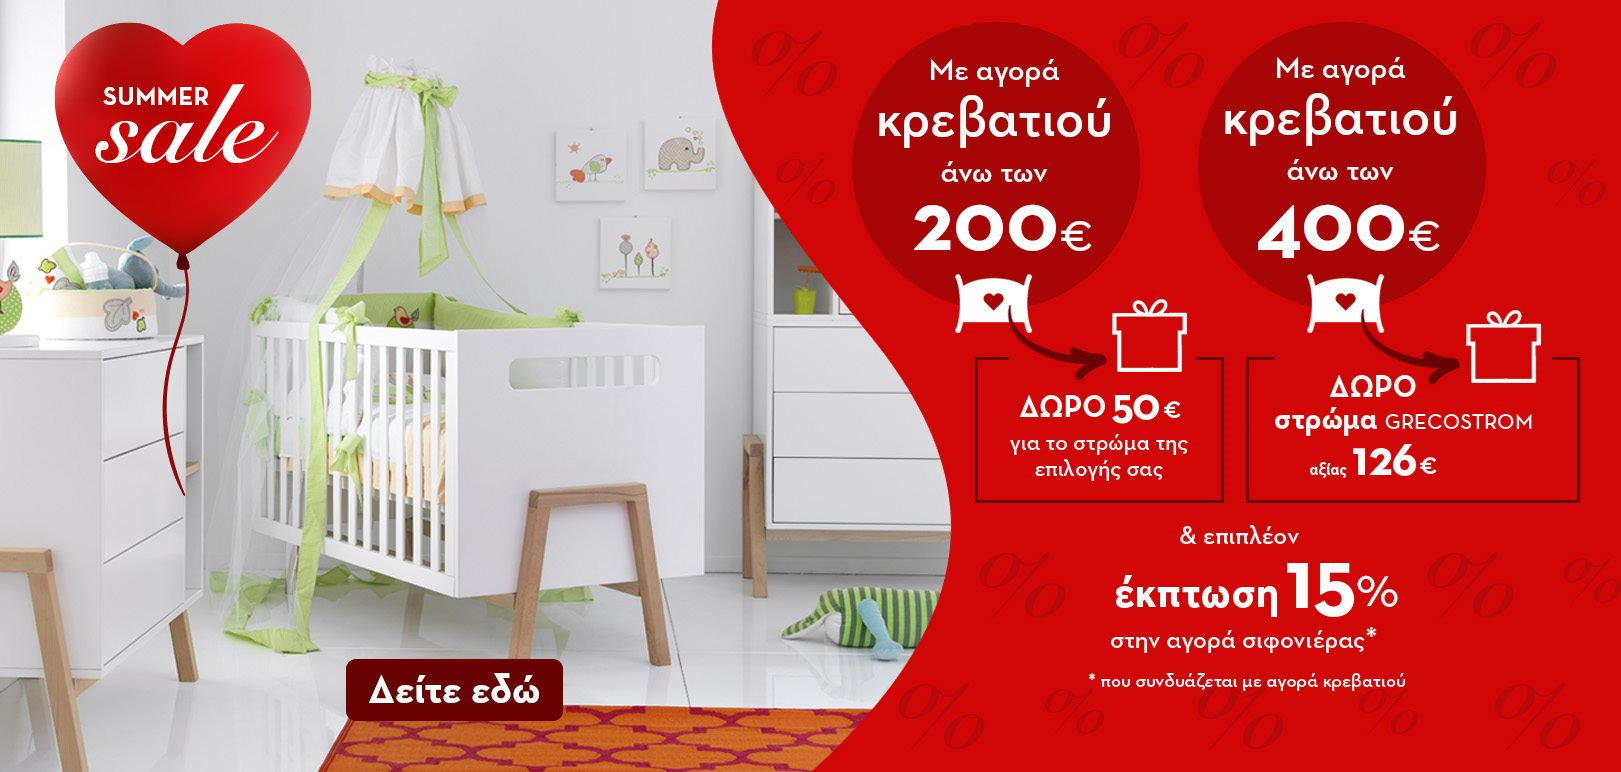 4a809a9bcfd Προίκα Μωρού | Βρεφικά Δωμάτια | Έπιπλα για μωρά | ΗΡΑ